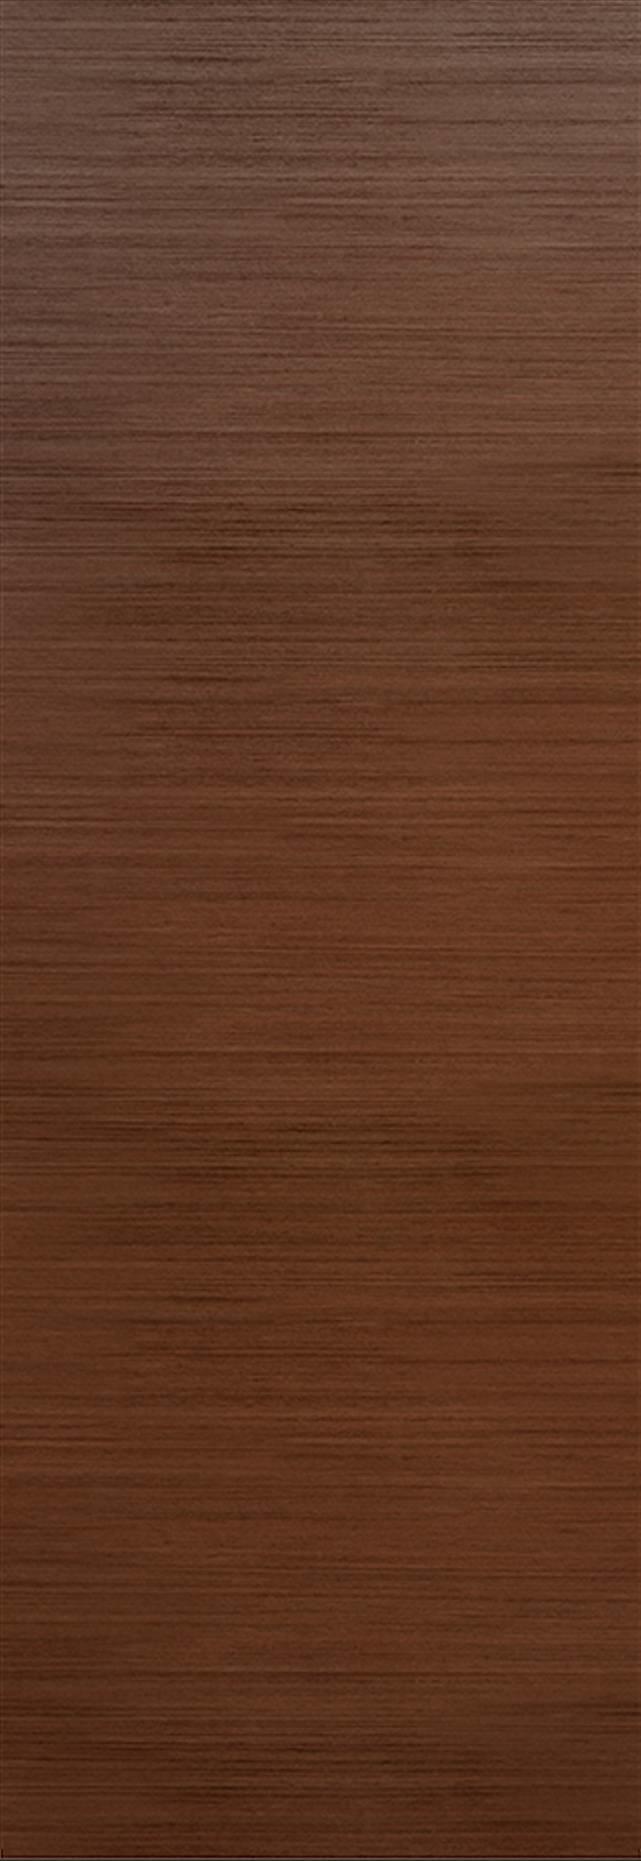 Tivoli А-2 Invisible цвет - Темный орех Без стекла (ДГ)